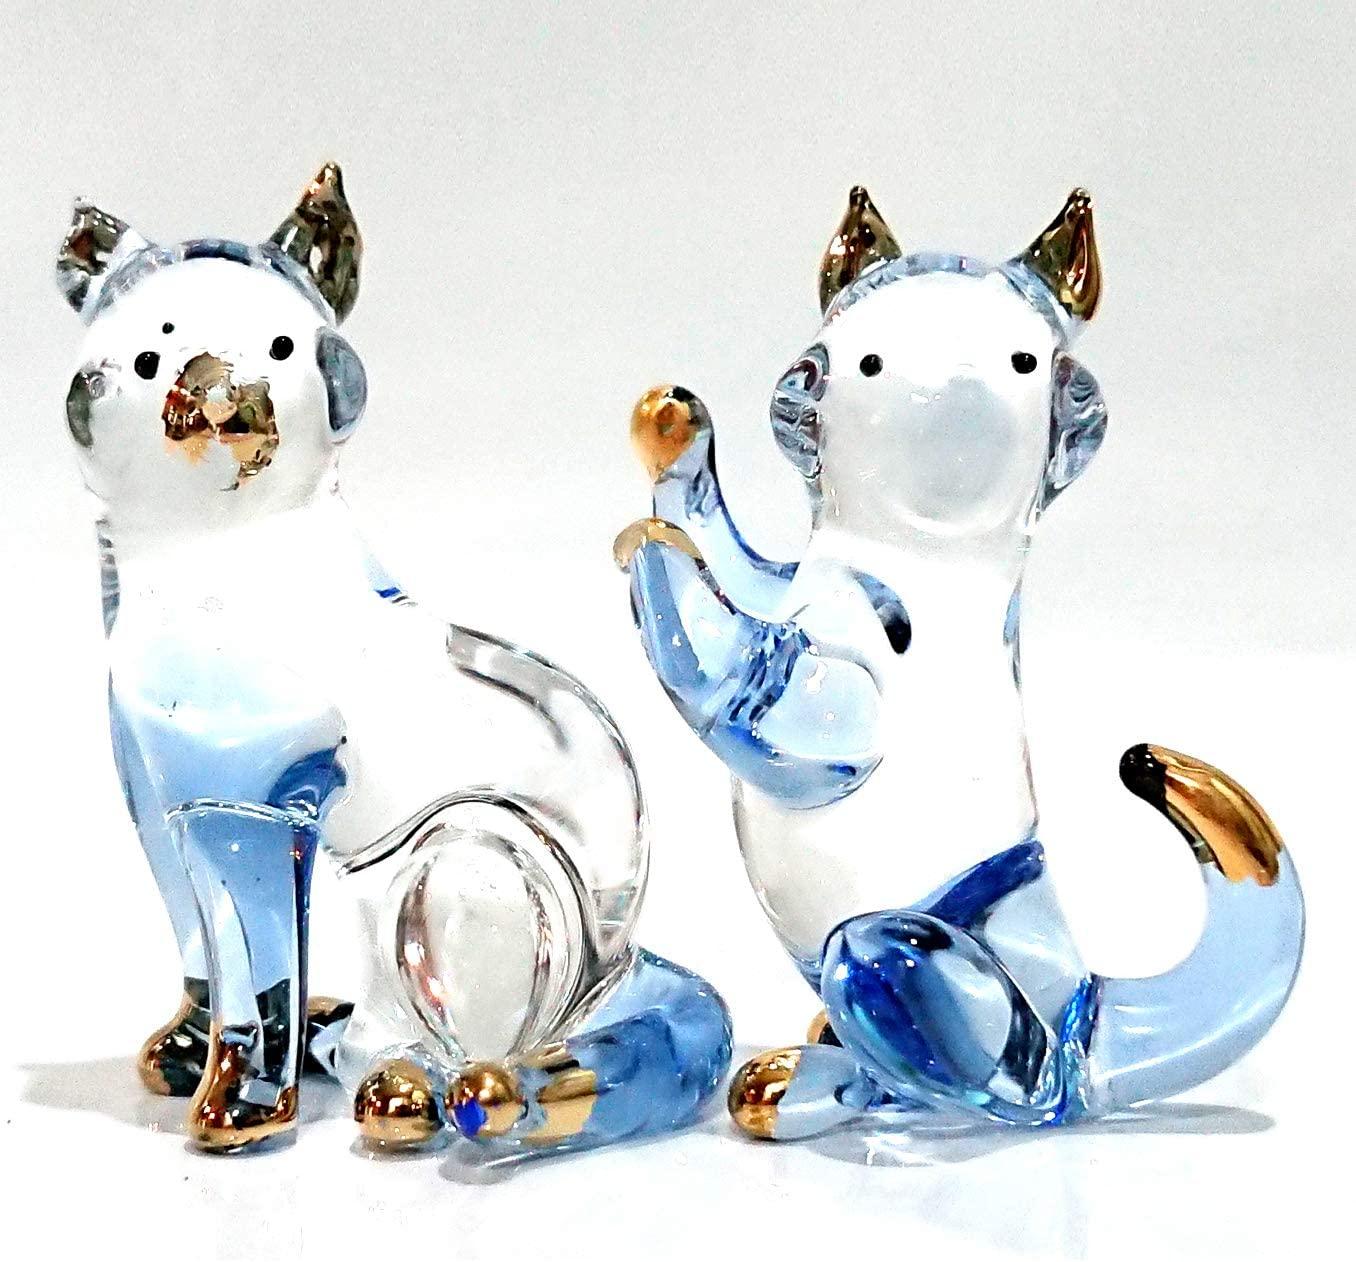 Sansukjai 2 Cats Miniature Figurines Animals Hand Blown Glass Art 22k Gold Trim Collectible Gift Decorate, Clear Blue